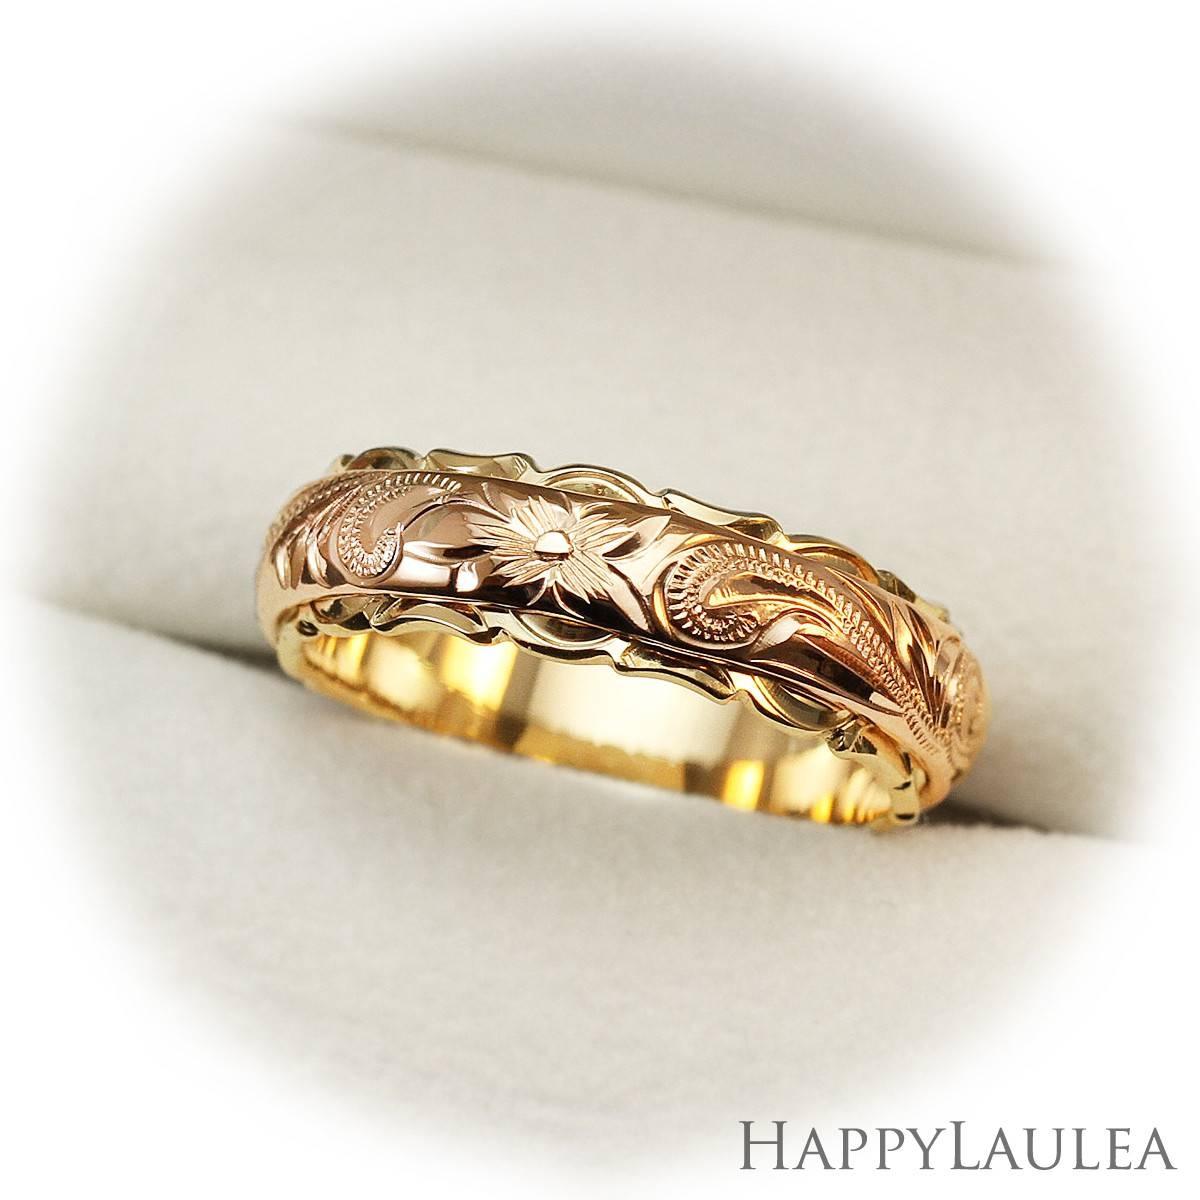 Engagement Rings : Inspirational Hawaiian Heirloom Engagement Inside Heritage Engagement Rings (View 8 of 15)